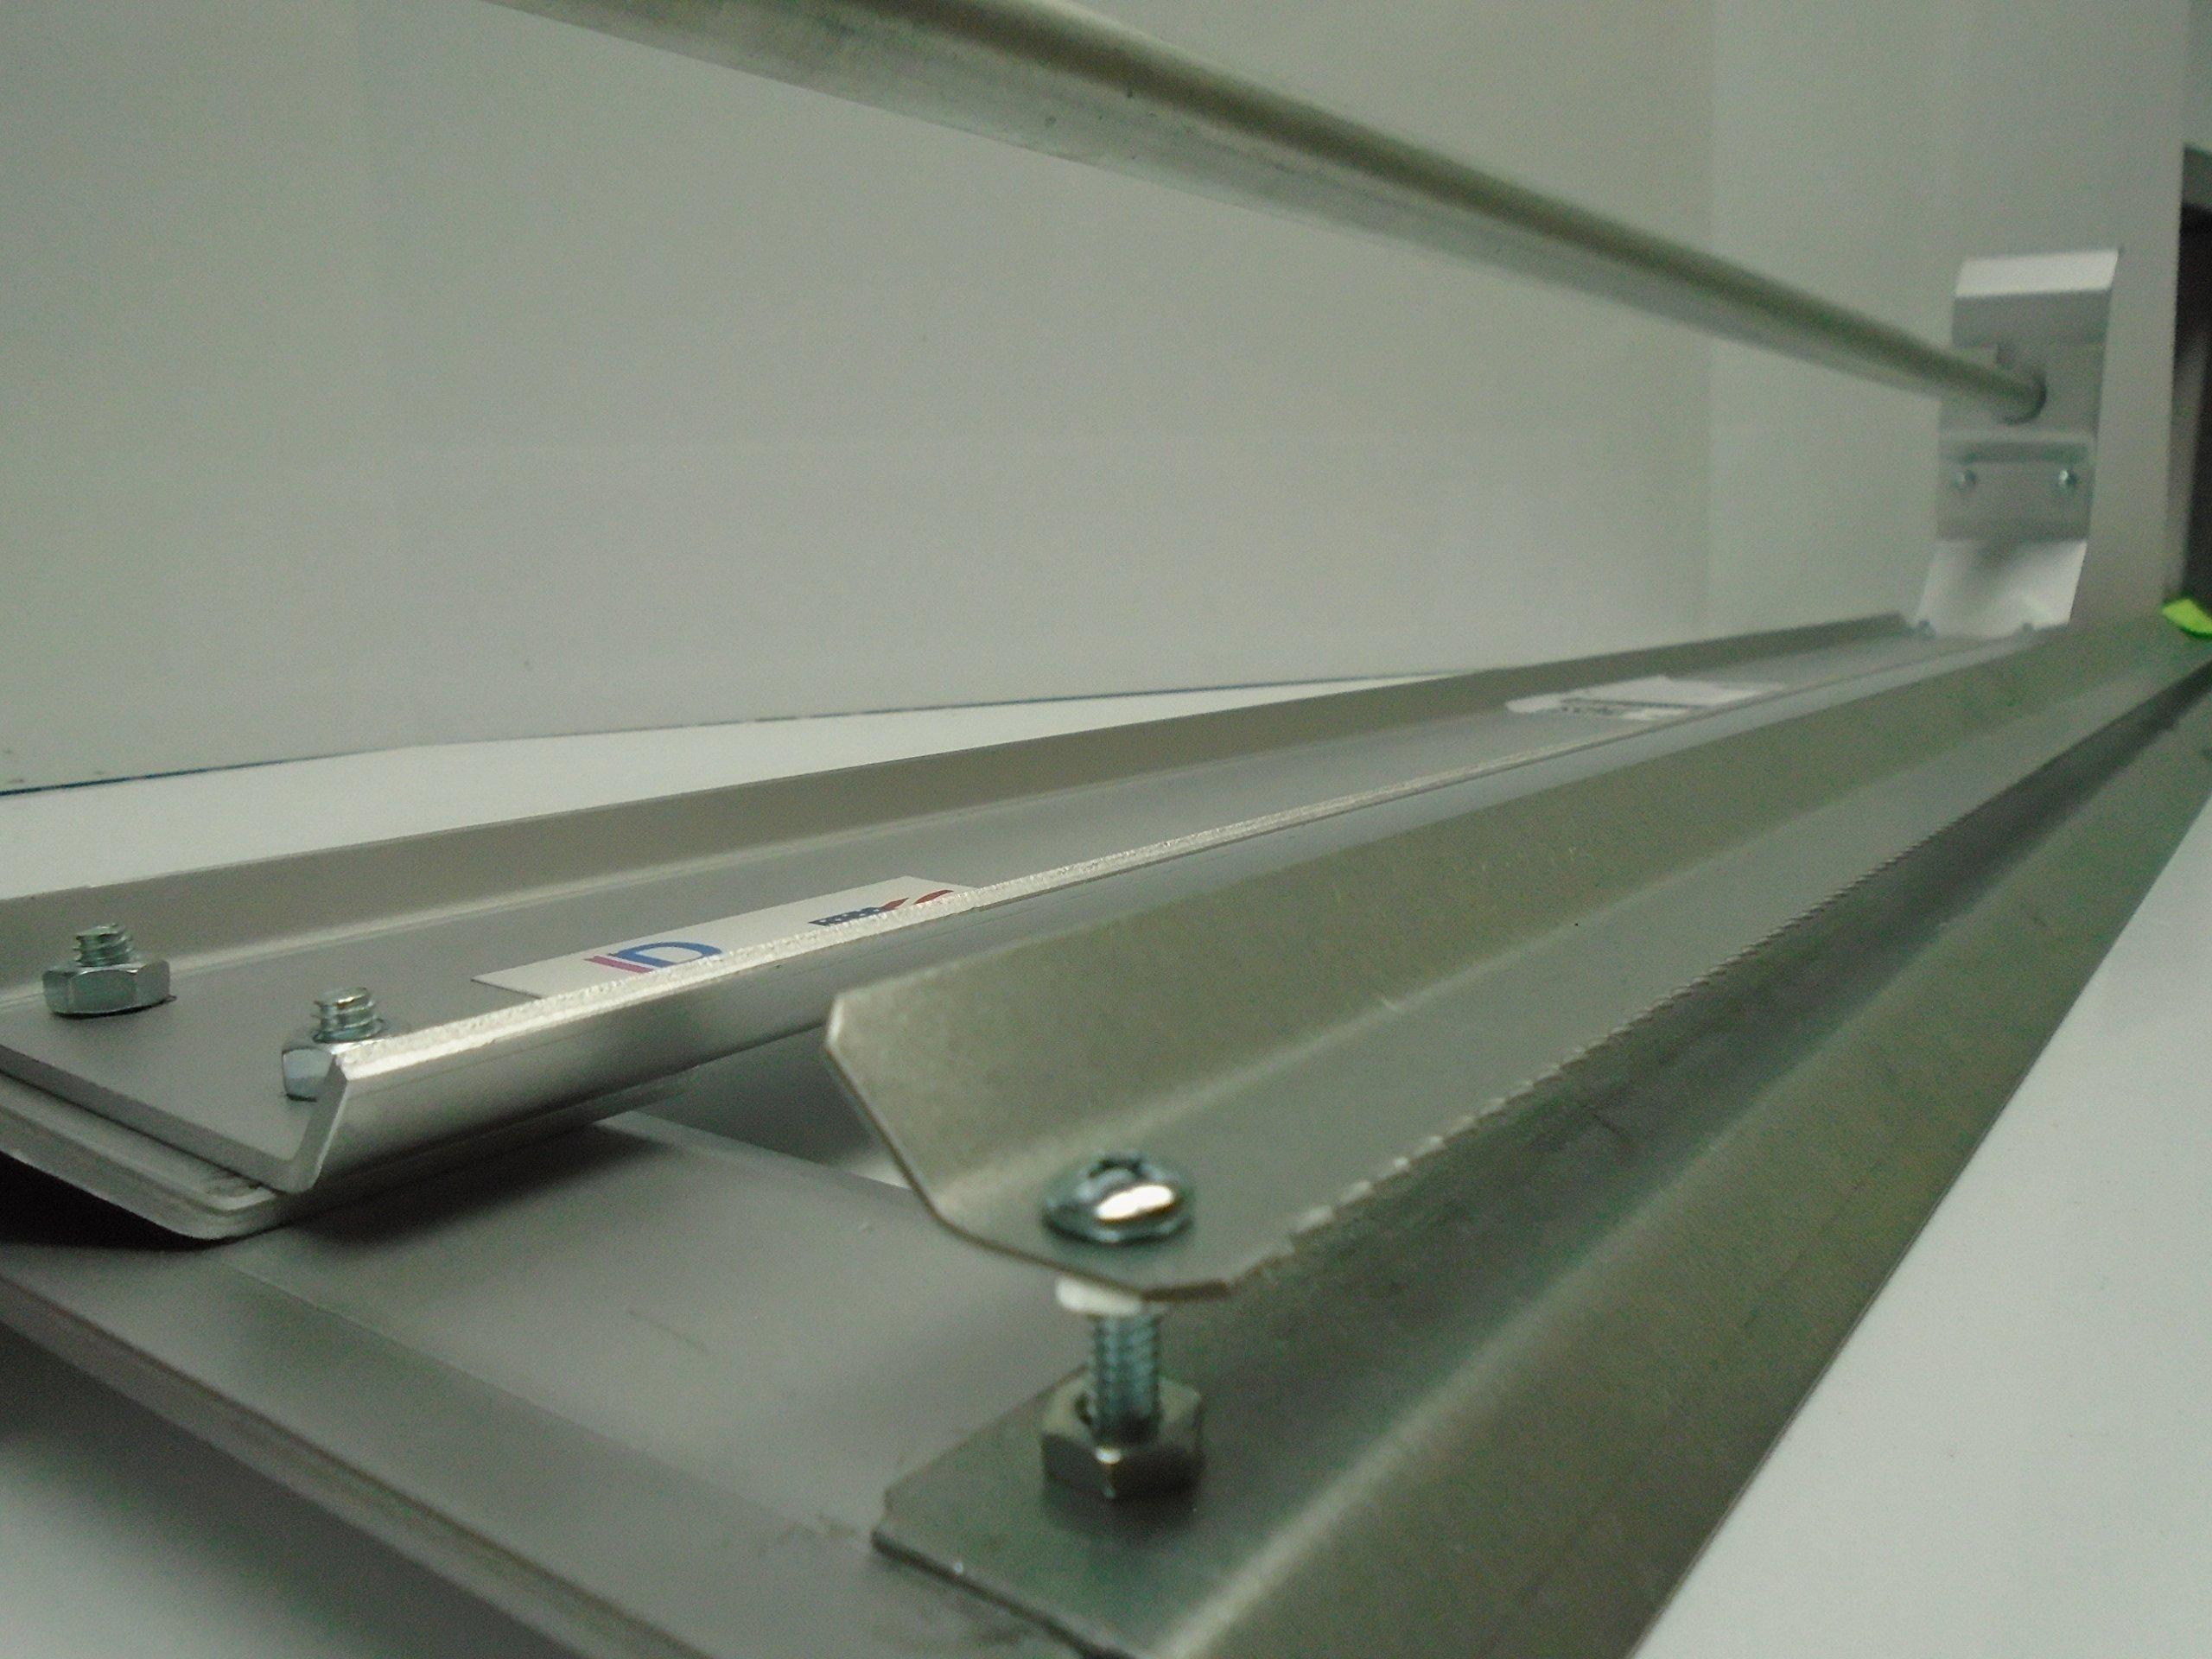 Paper Cutter Roll Dispenser Econoline 60 inches table mount Kraft paper Duralov by Duralov (Image #4)